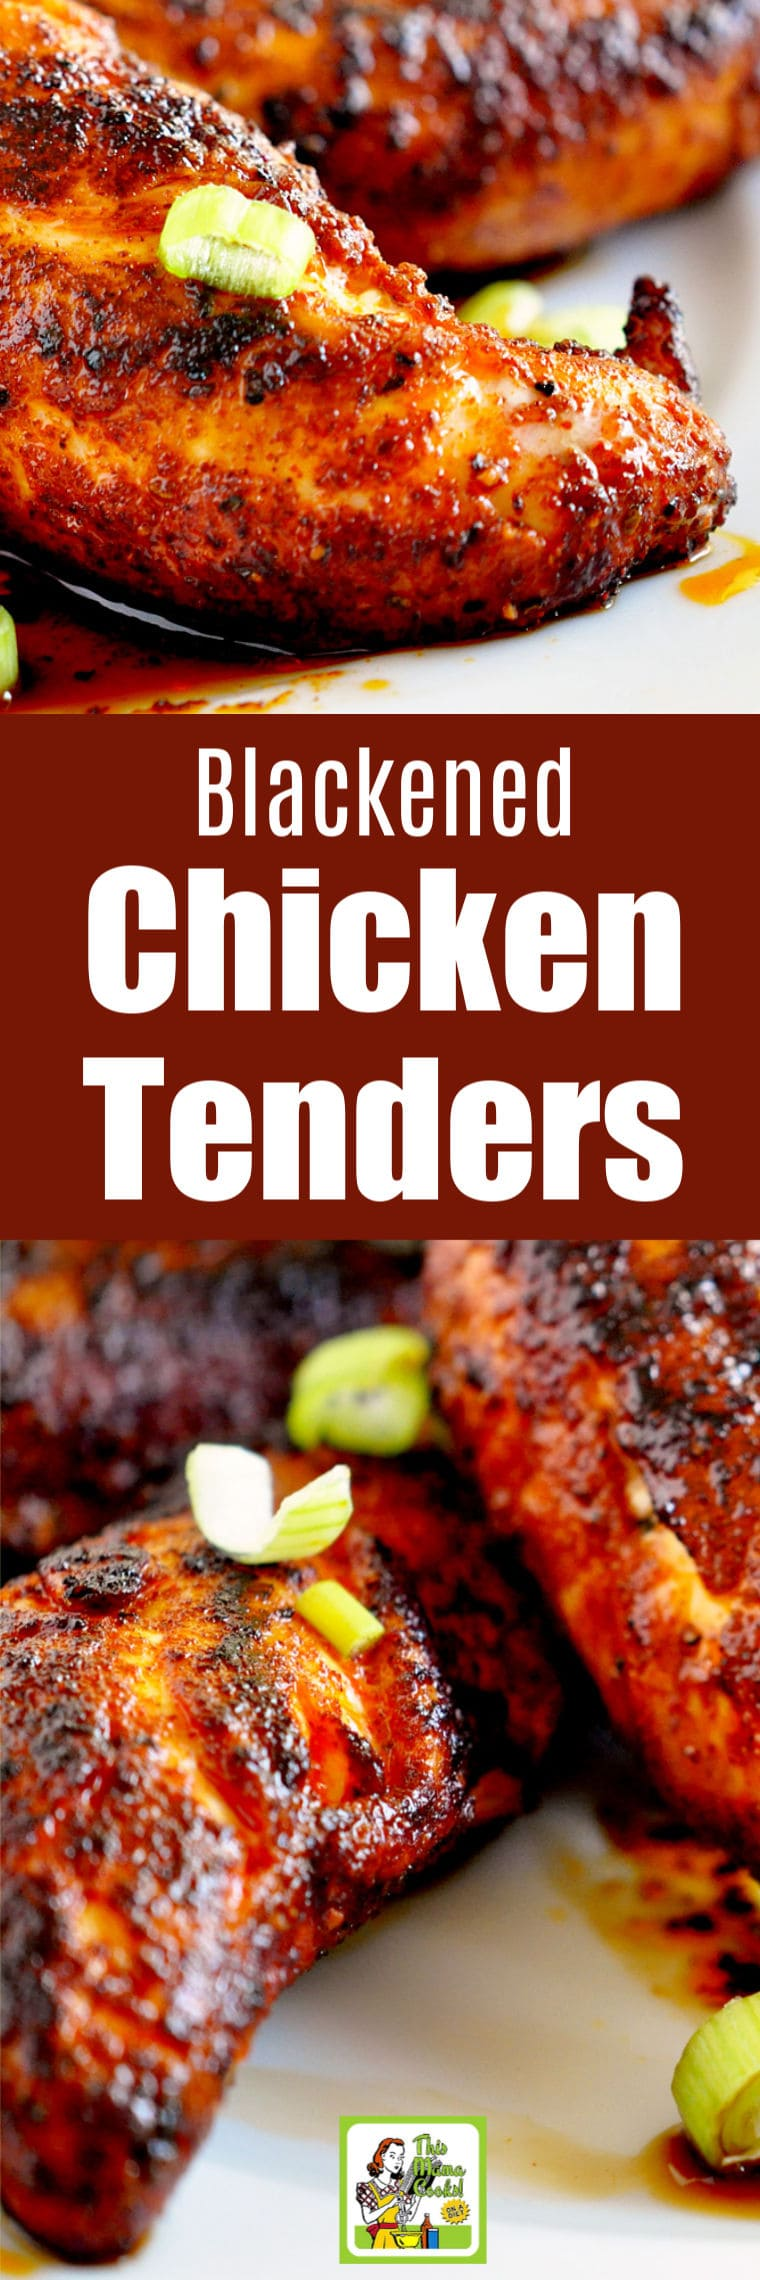 Blackened Chicken Tenders Recipe